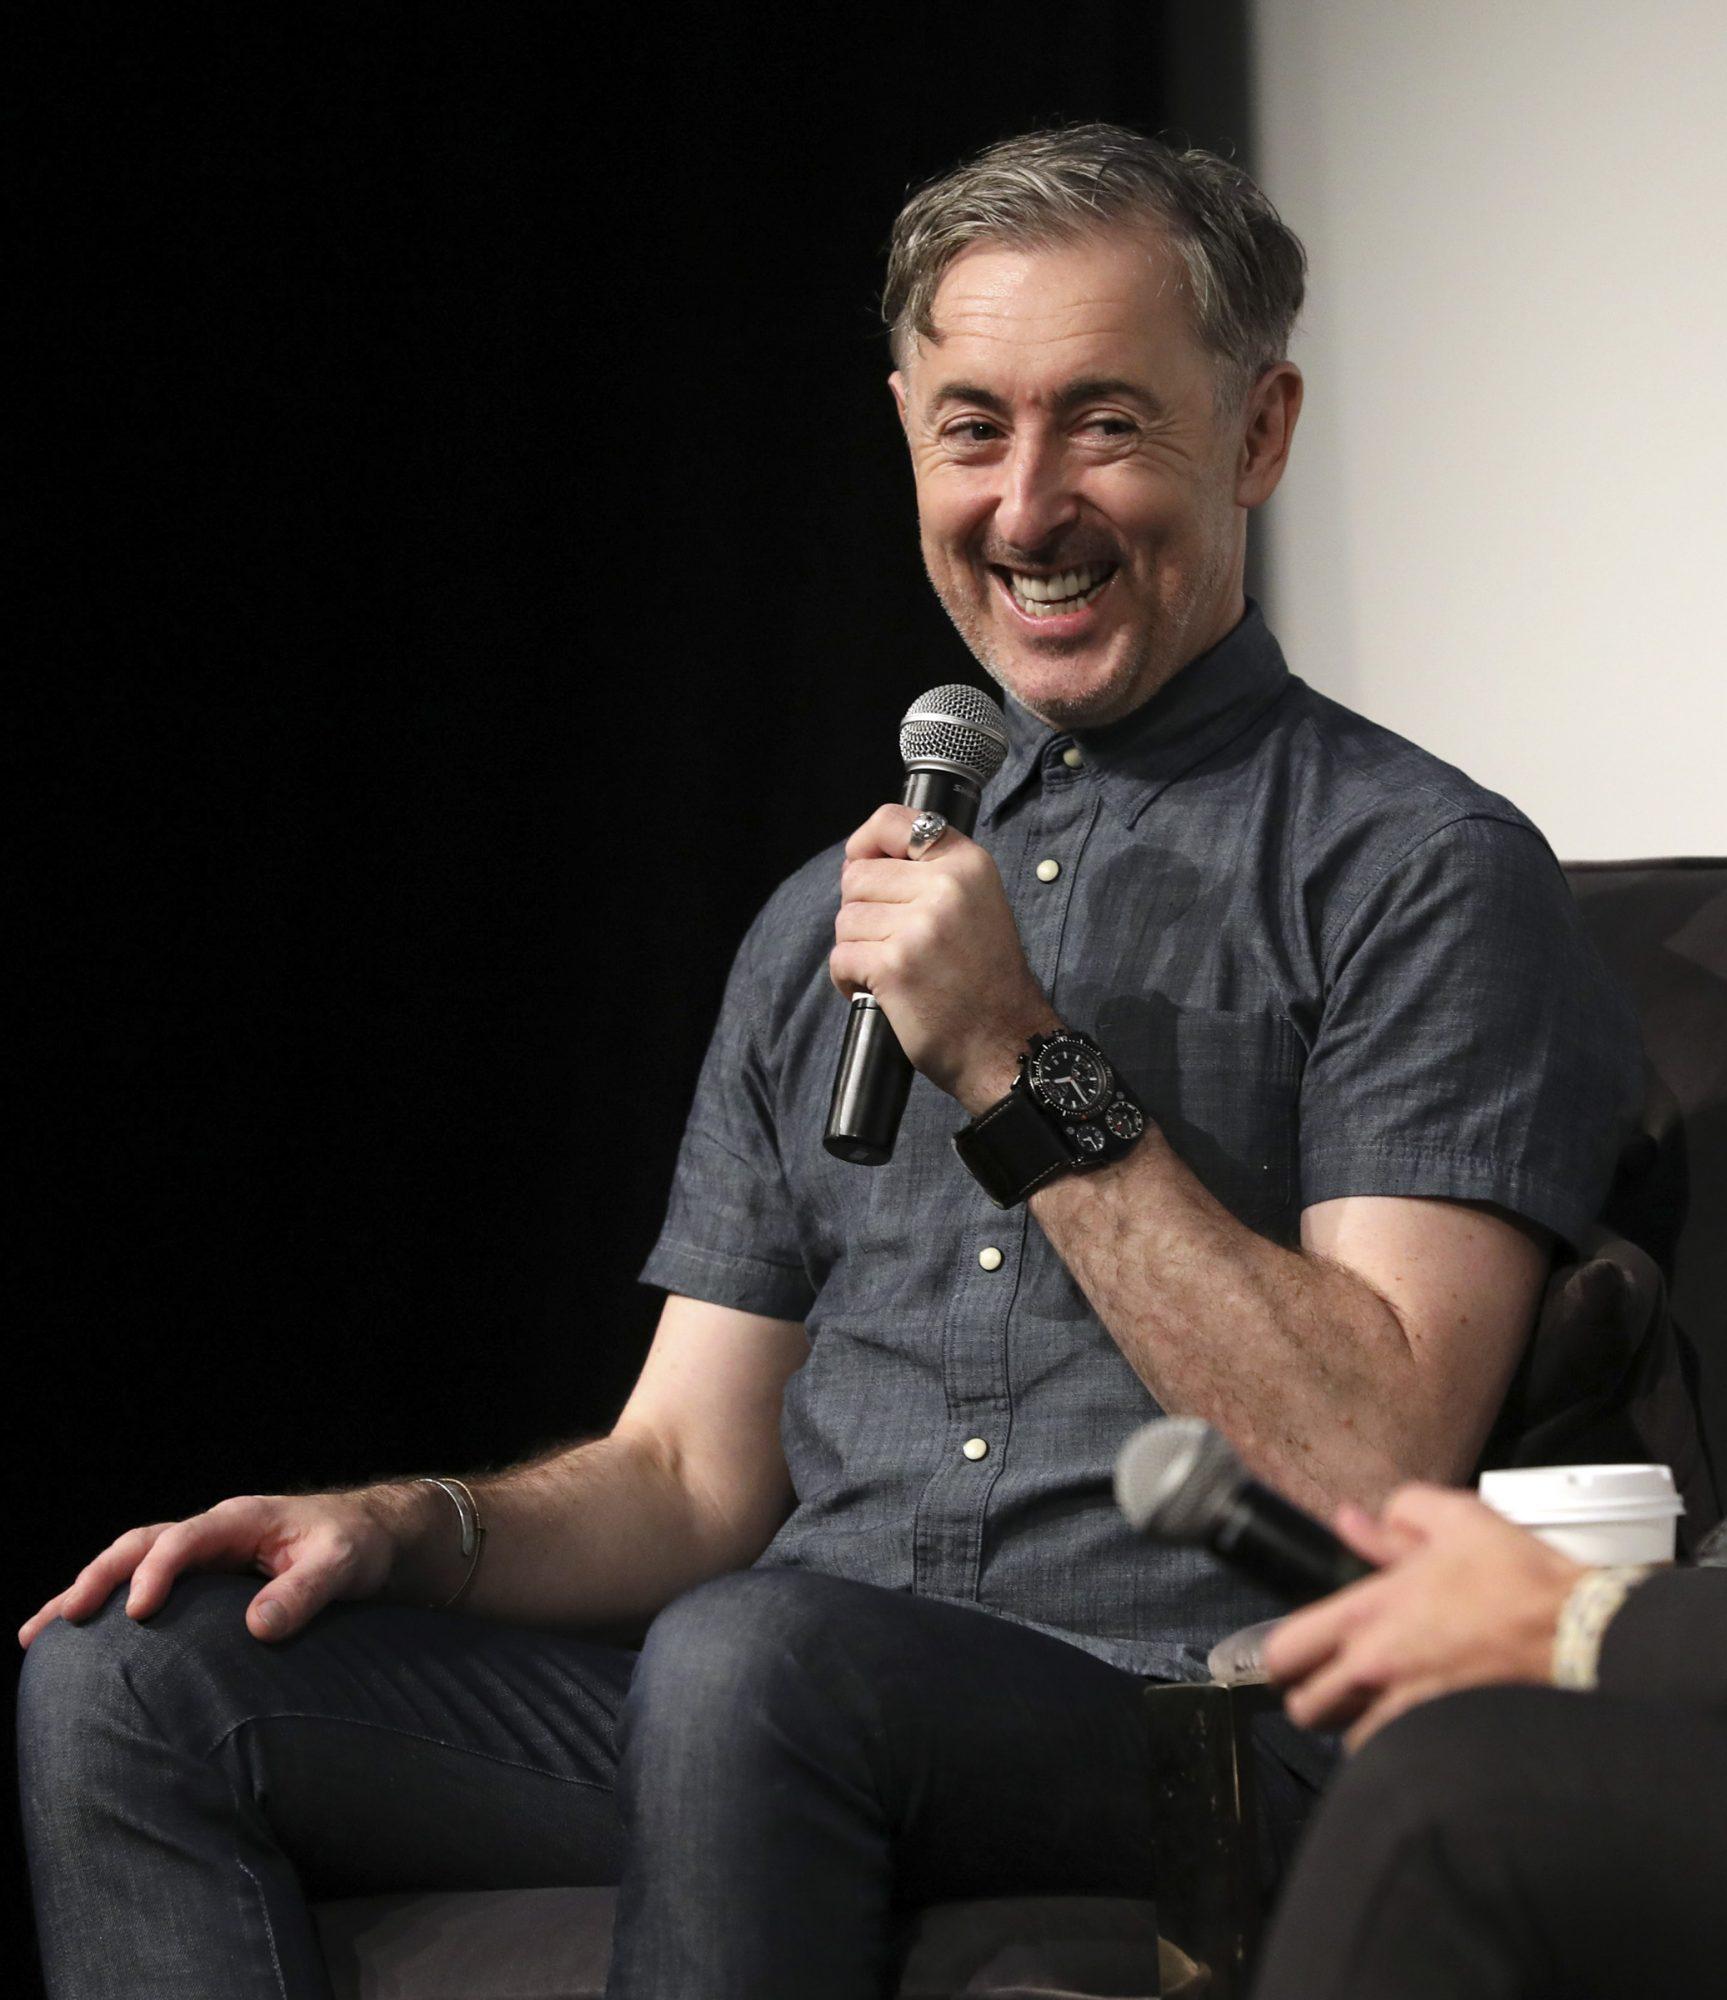 22nd SCAD Savannah Film Festival - In Conversation With Alan Cumming